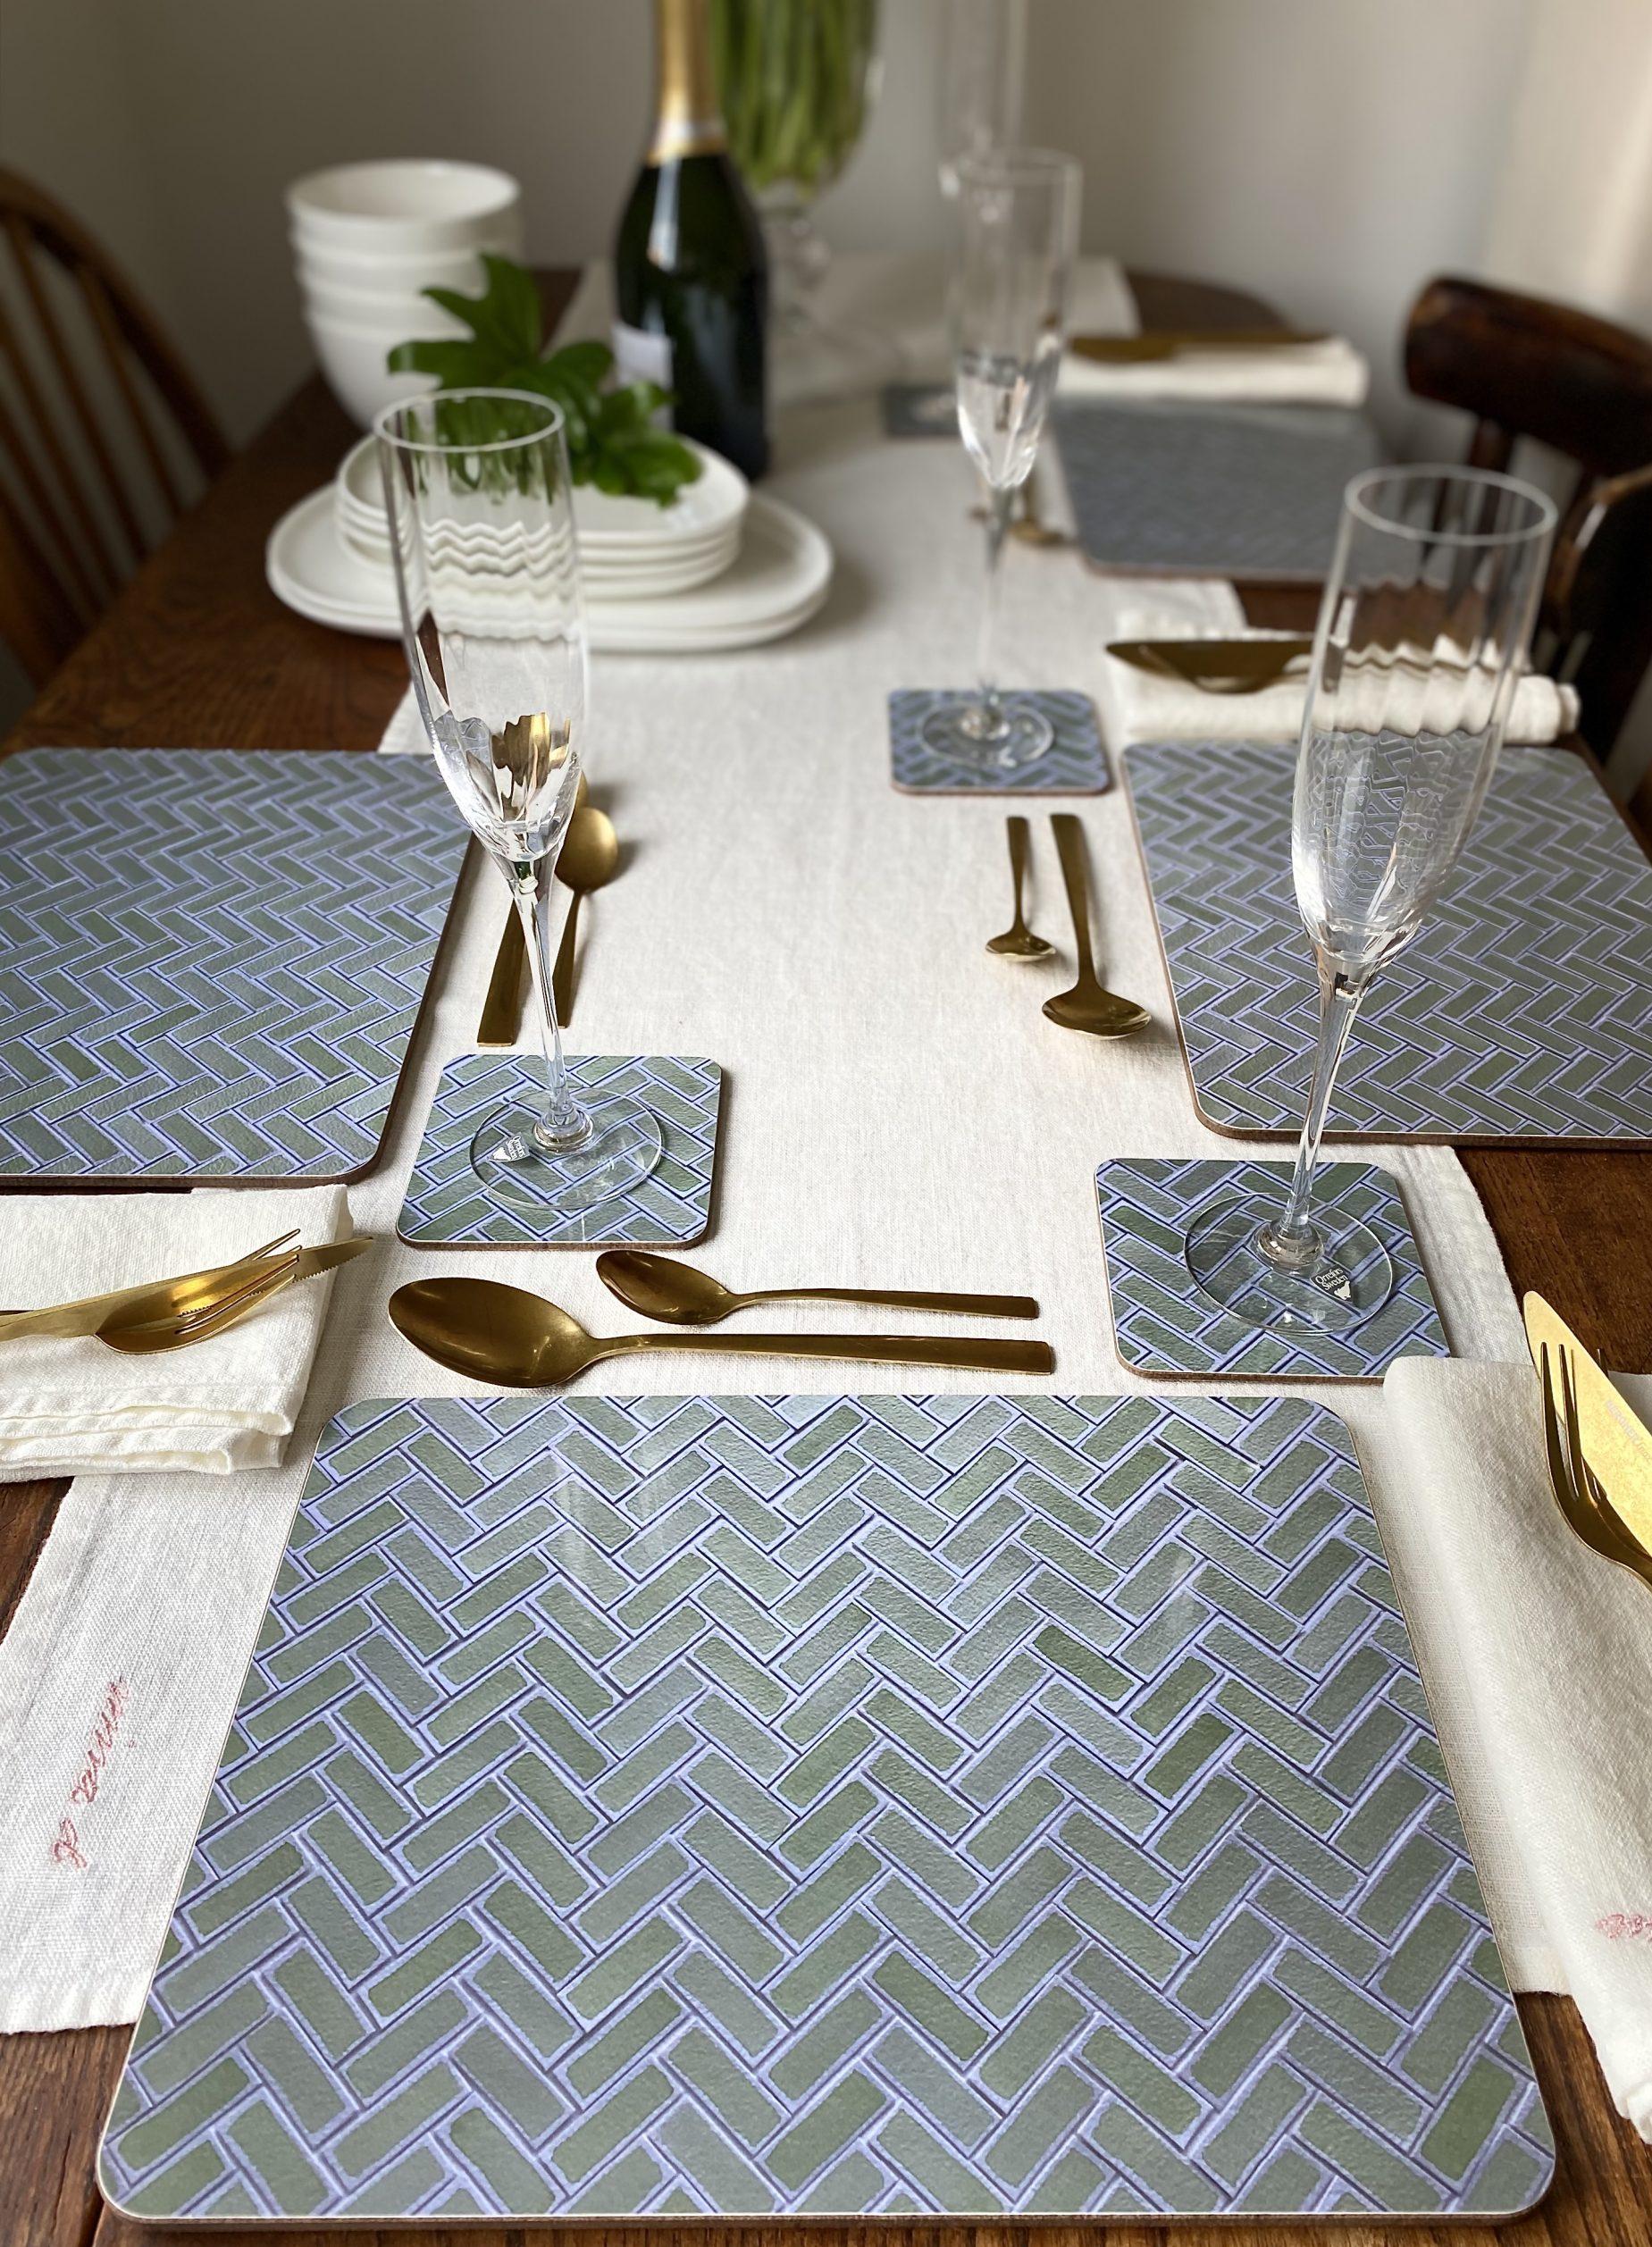 Ekotemplet Placemats Table Mats